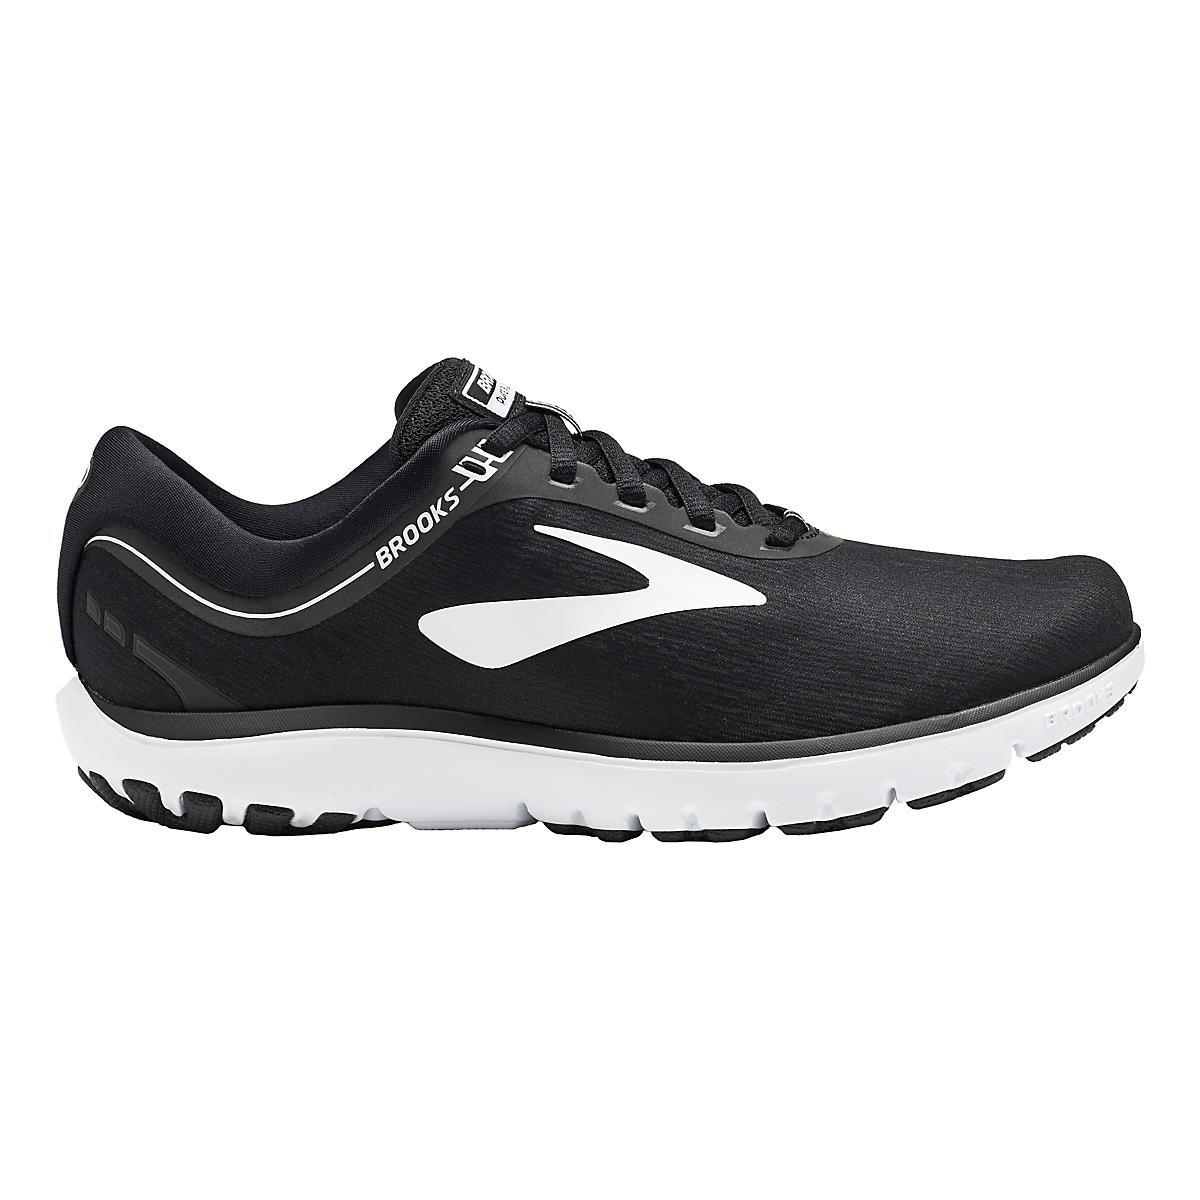 8fa41b21448 Womens Brooks PureFlow 7 Running Shoe at Road Runner Sports